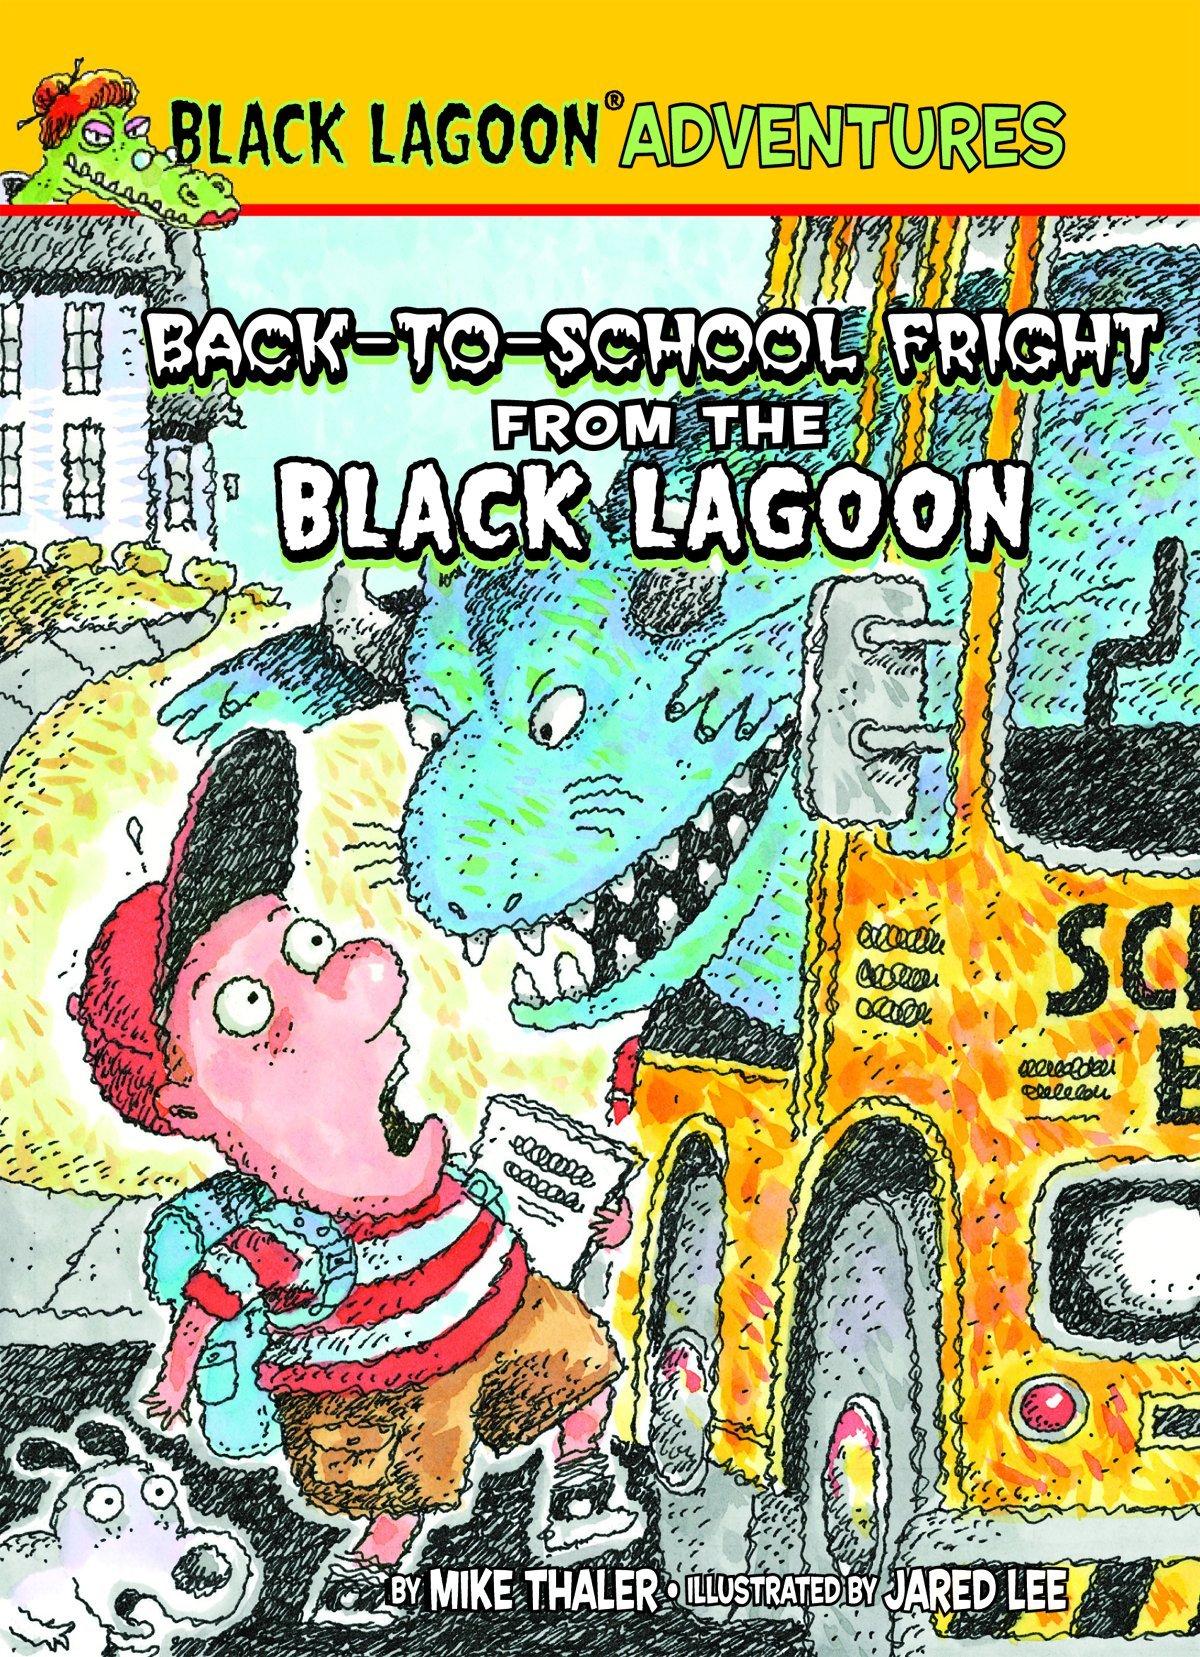 Download Black Lagoon Adventures Set 2 PDF